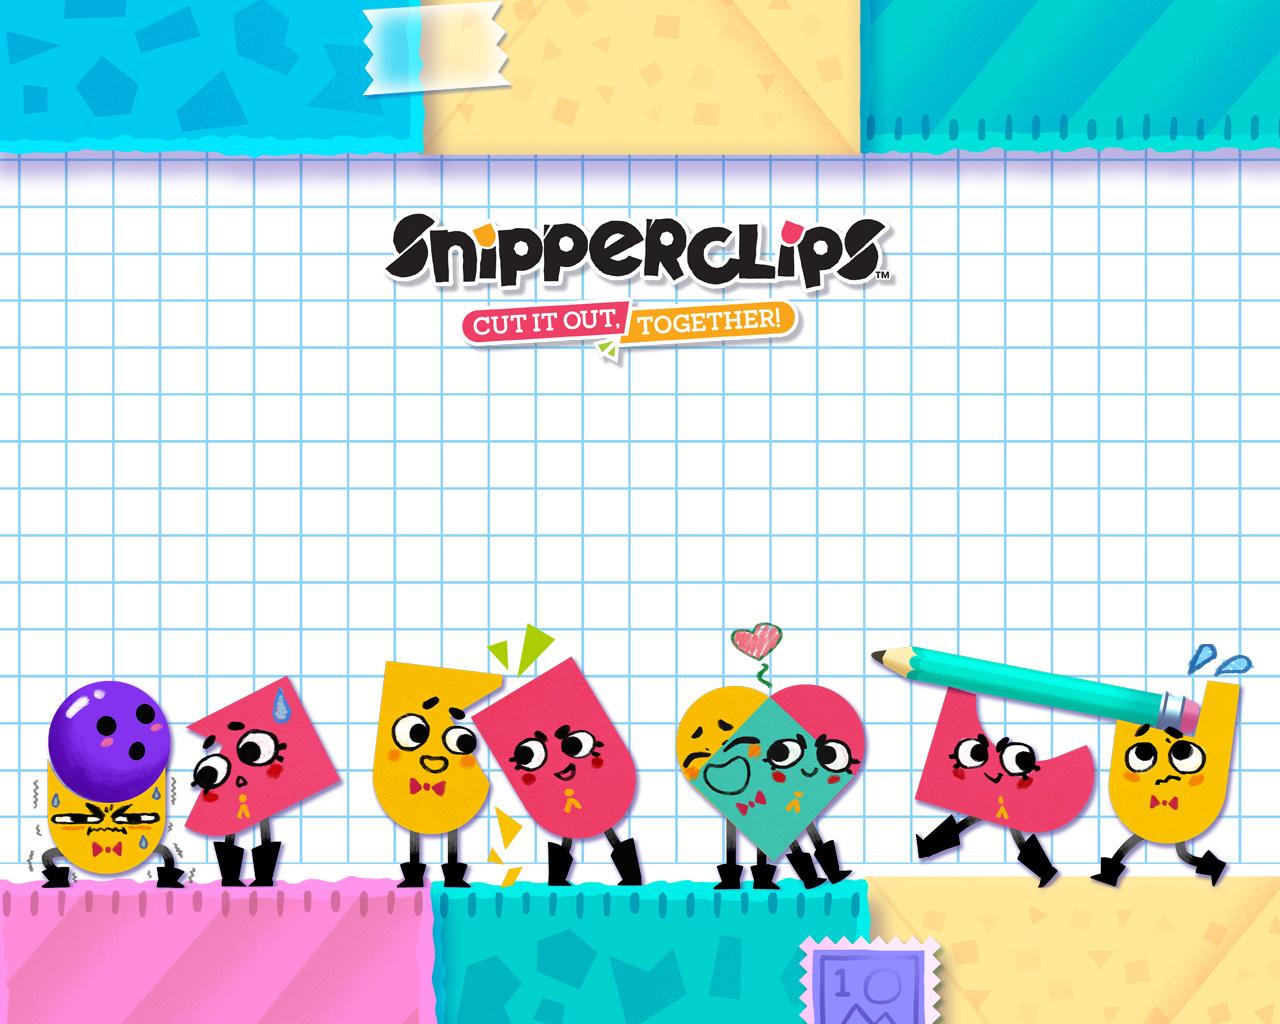 Snipperclips_1280x1024.jpg